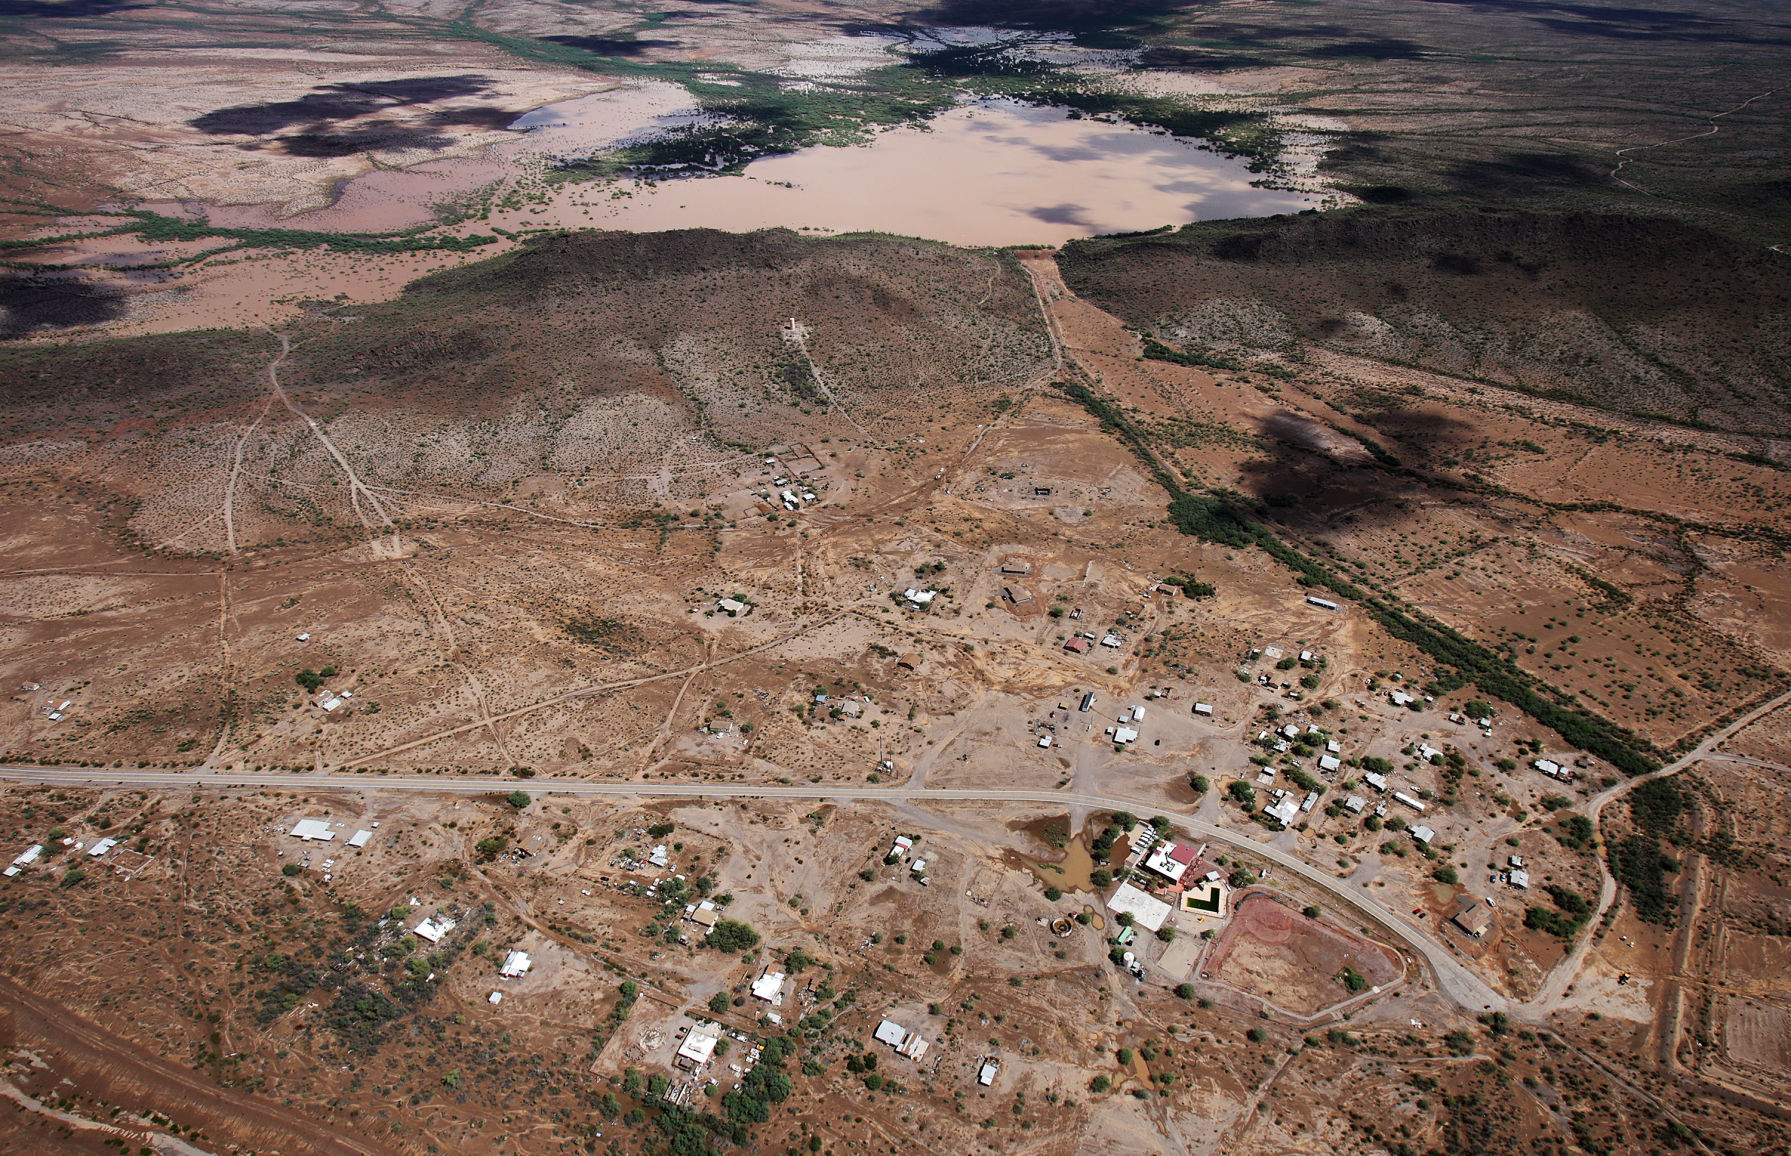 Evacuations lifted after flooding on Tohono O'odham Nation | Tucson.com